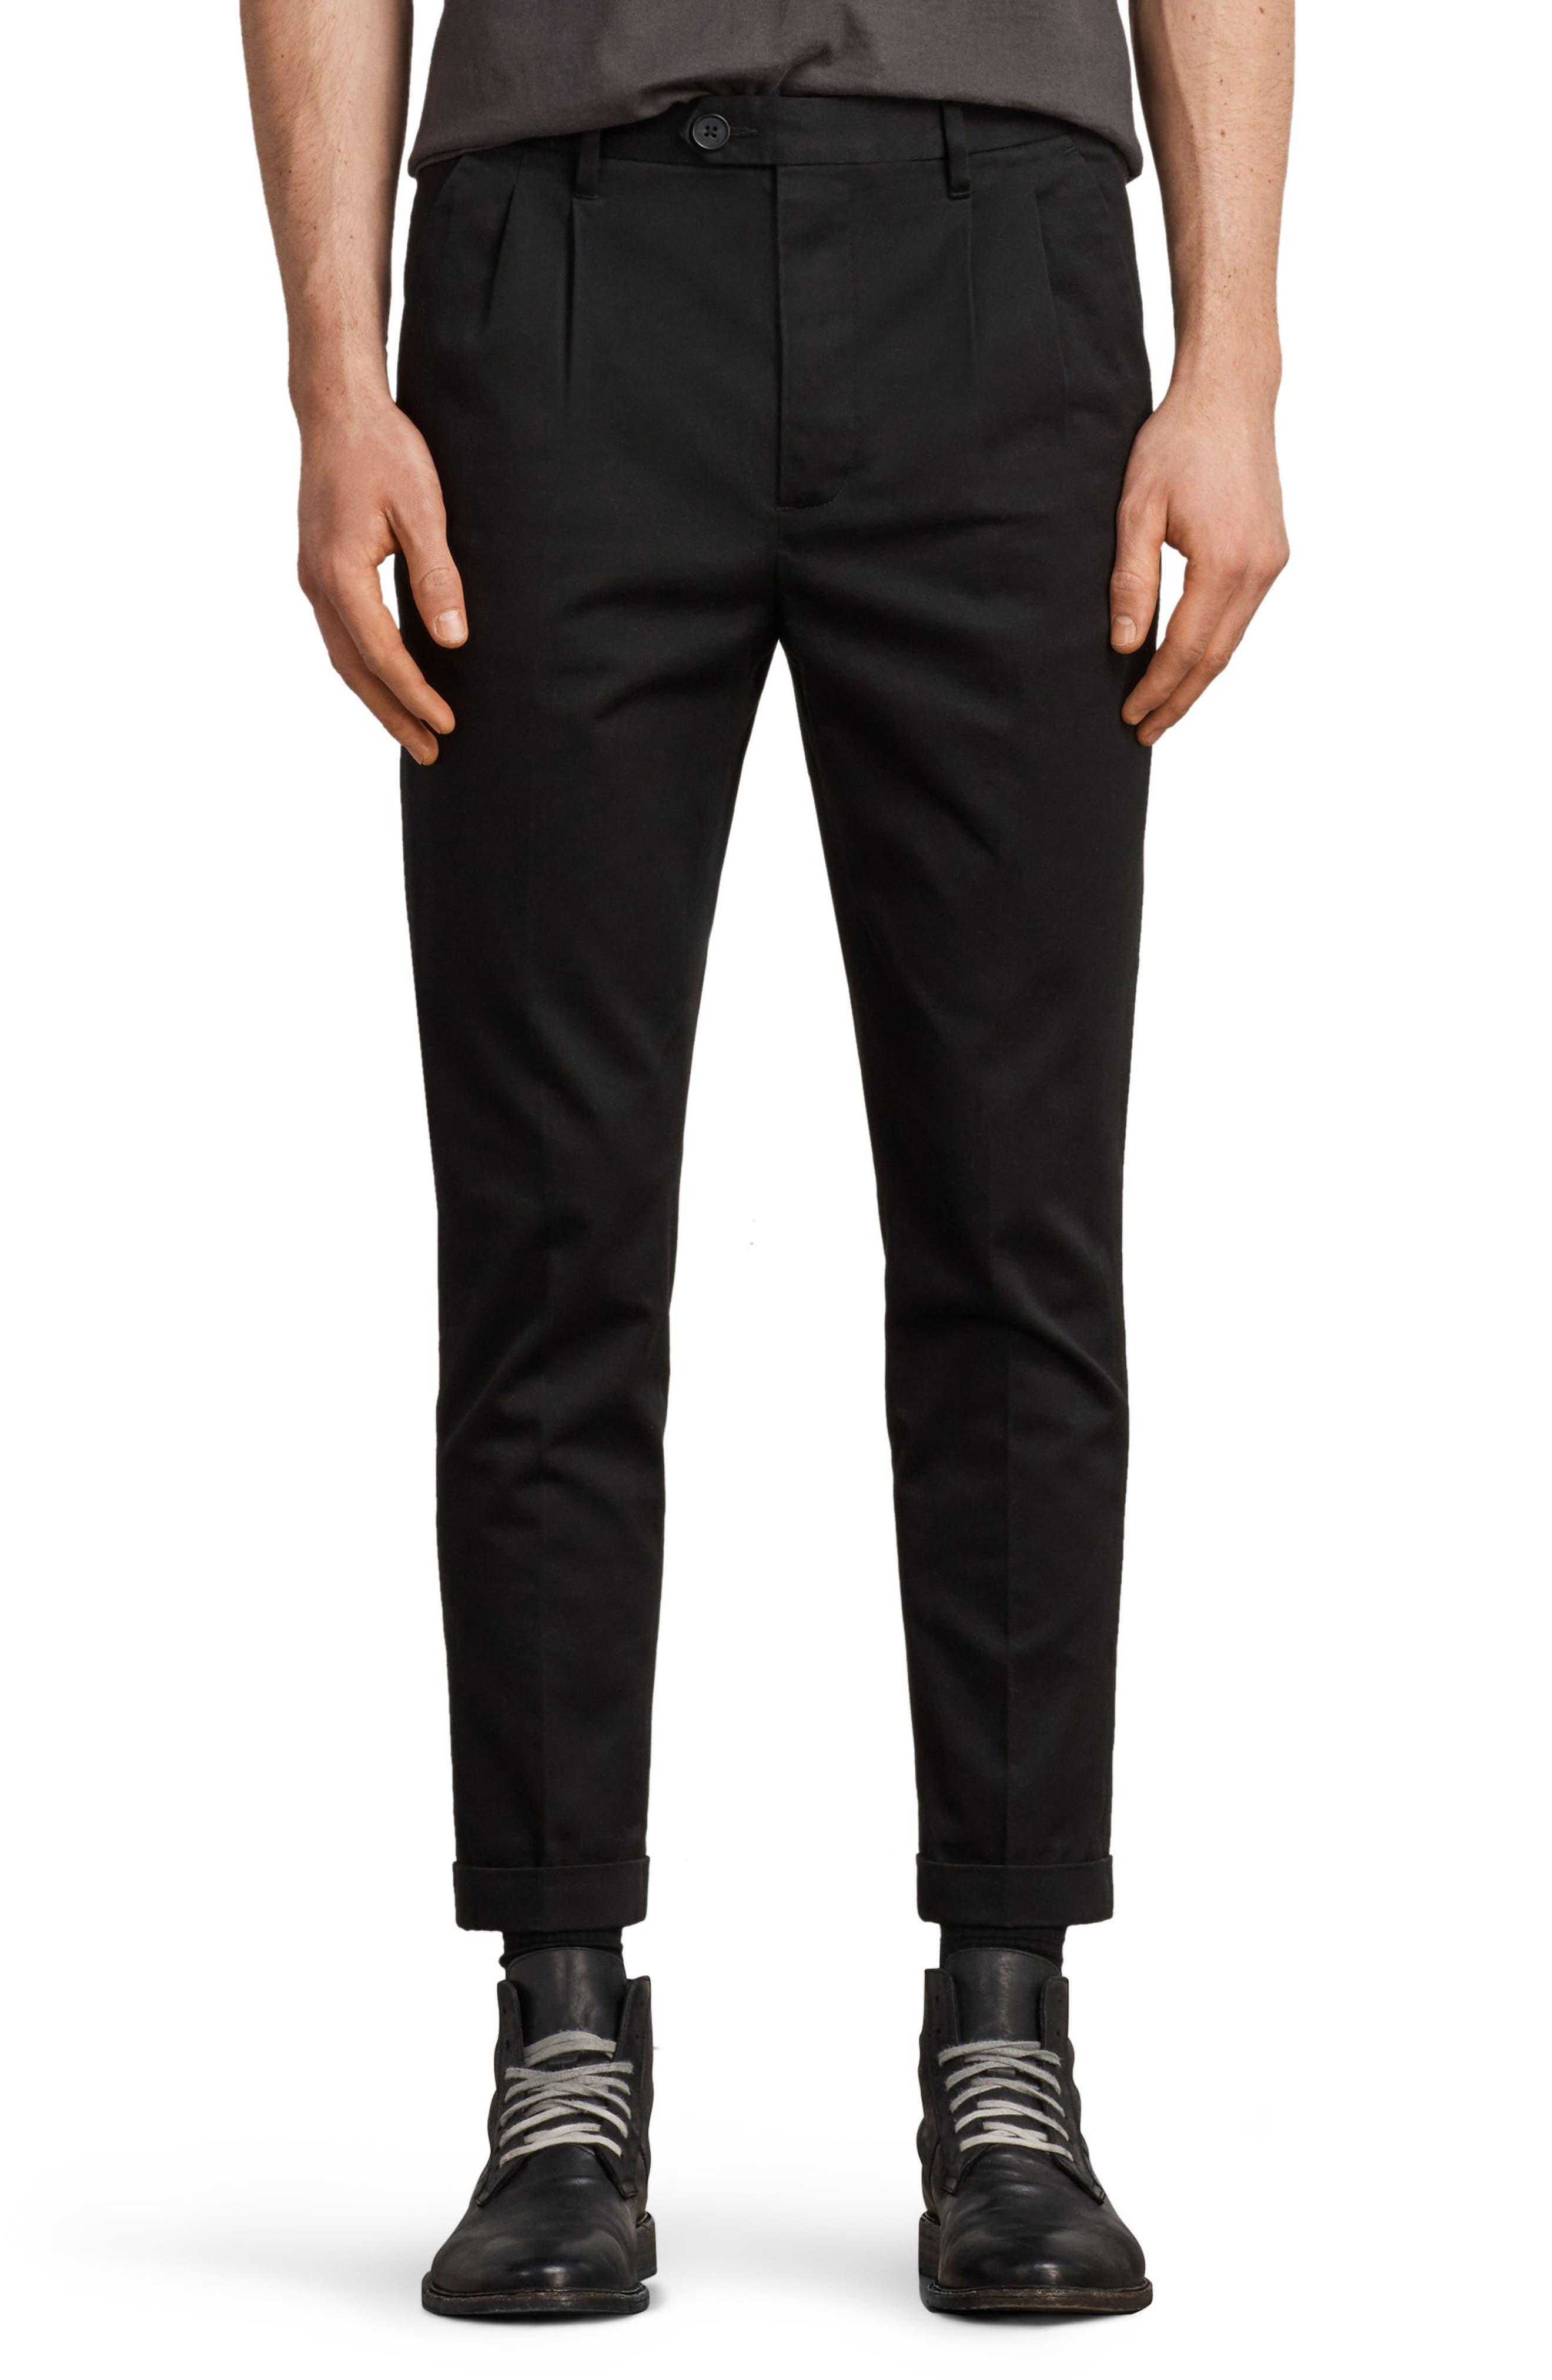 Salco Slim Fit Chino Pants,                         Main,                         color, Black